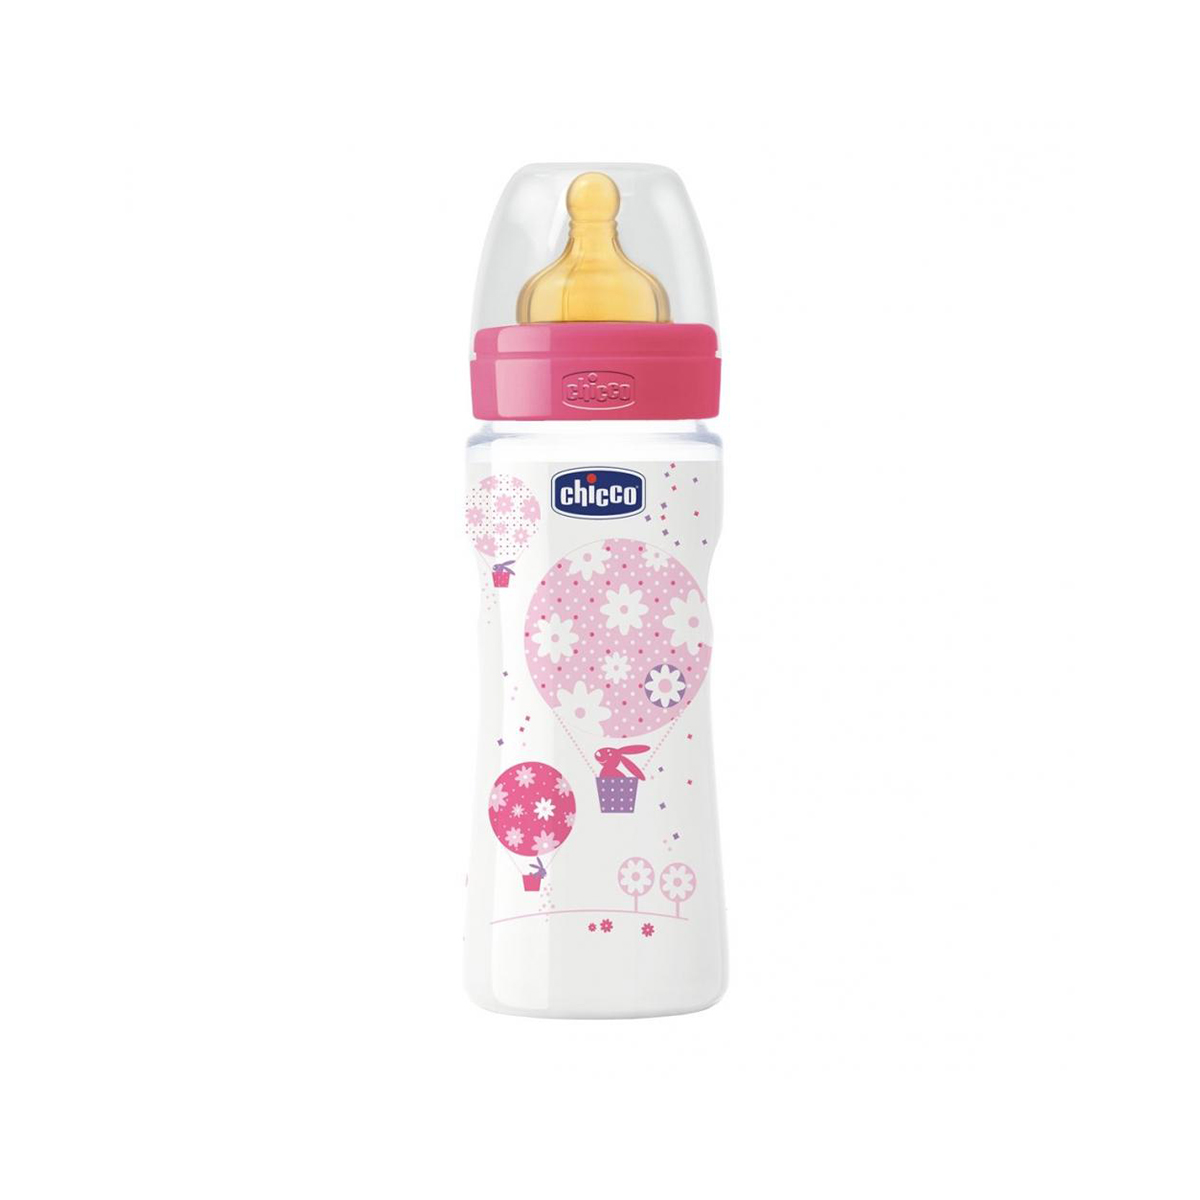 Biberon Wellbeing Chicco, 330 ml, 4 luni +, Roz imagine